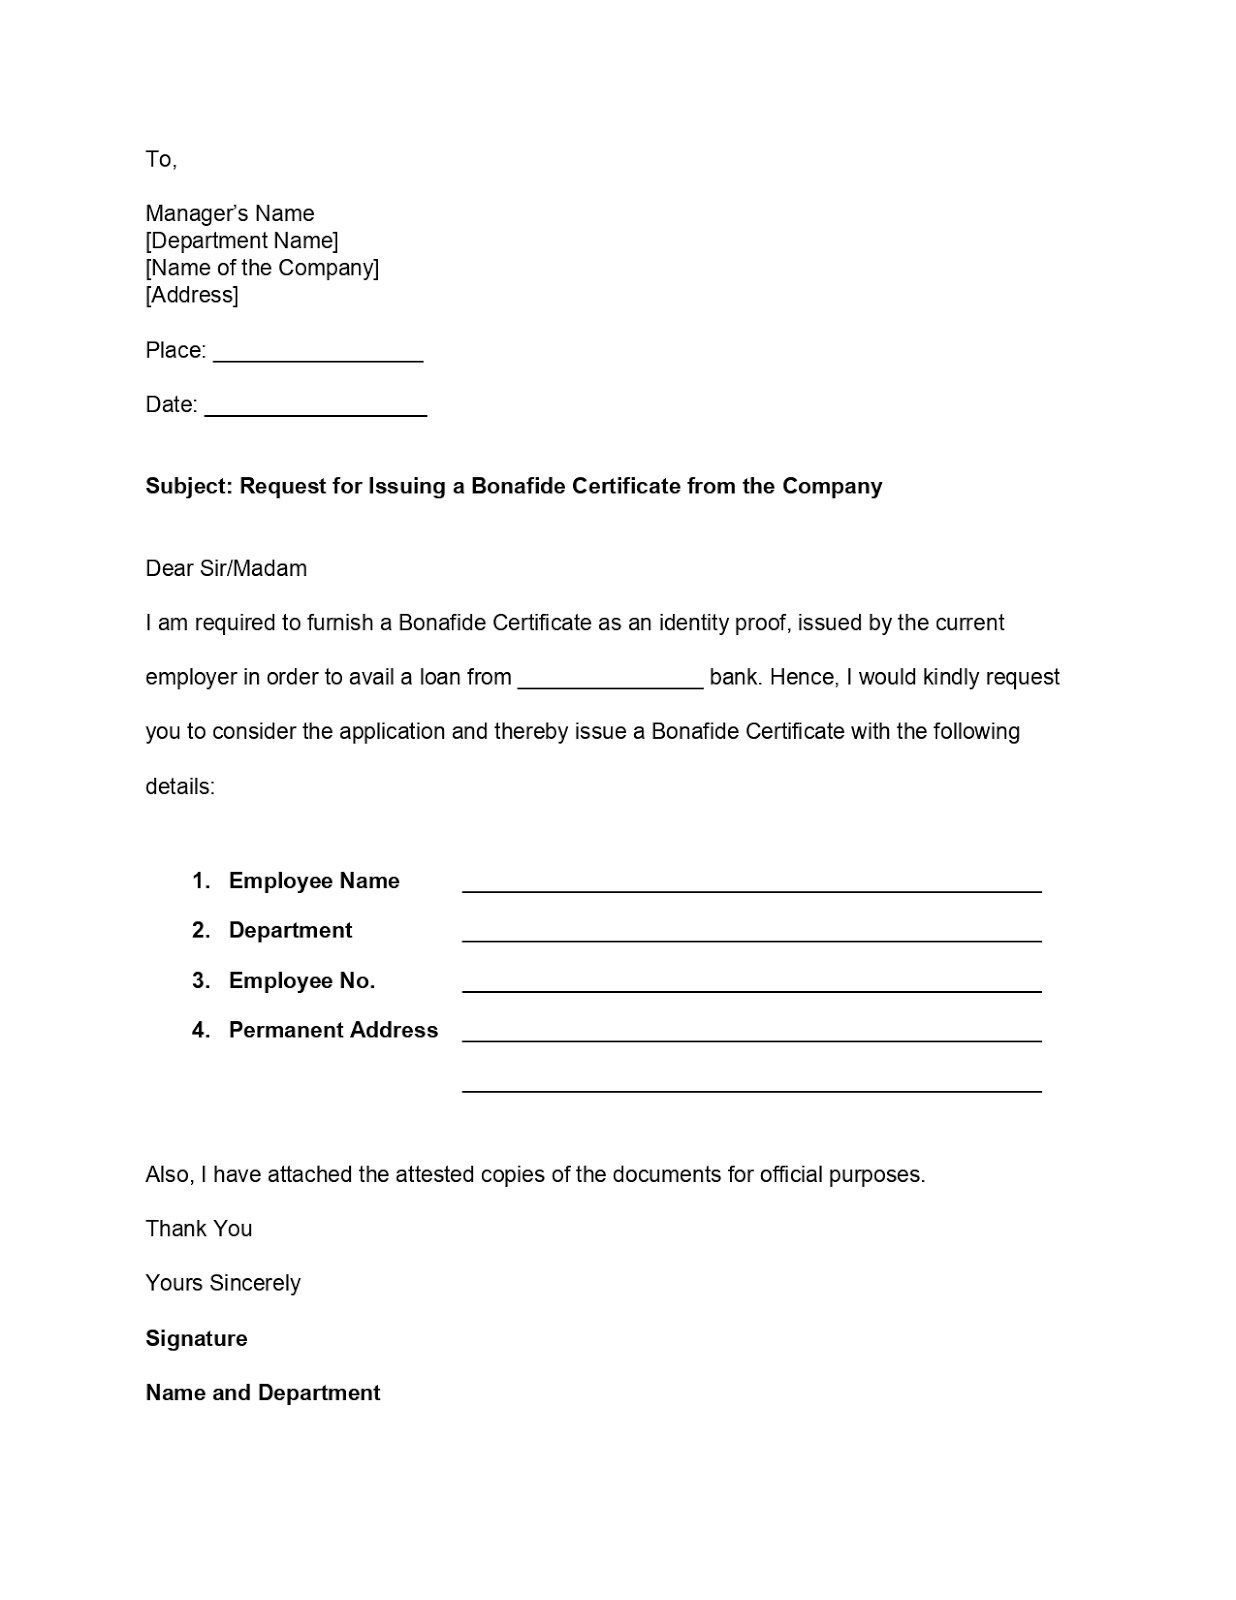 Bonafide Certificate Application Layout